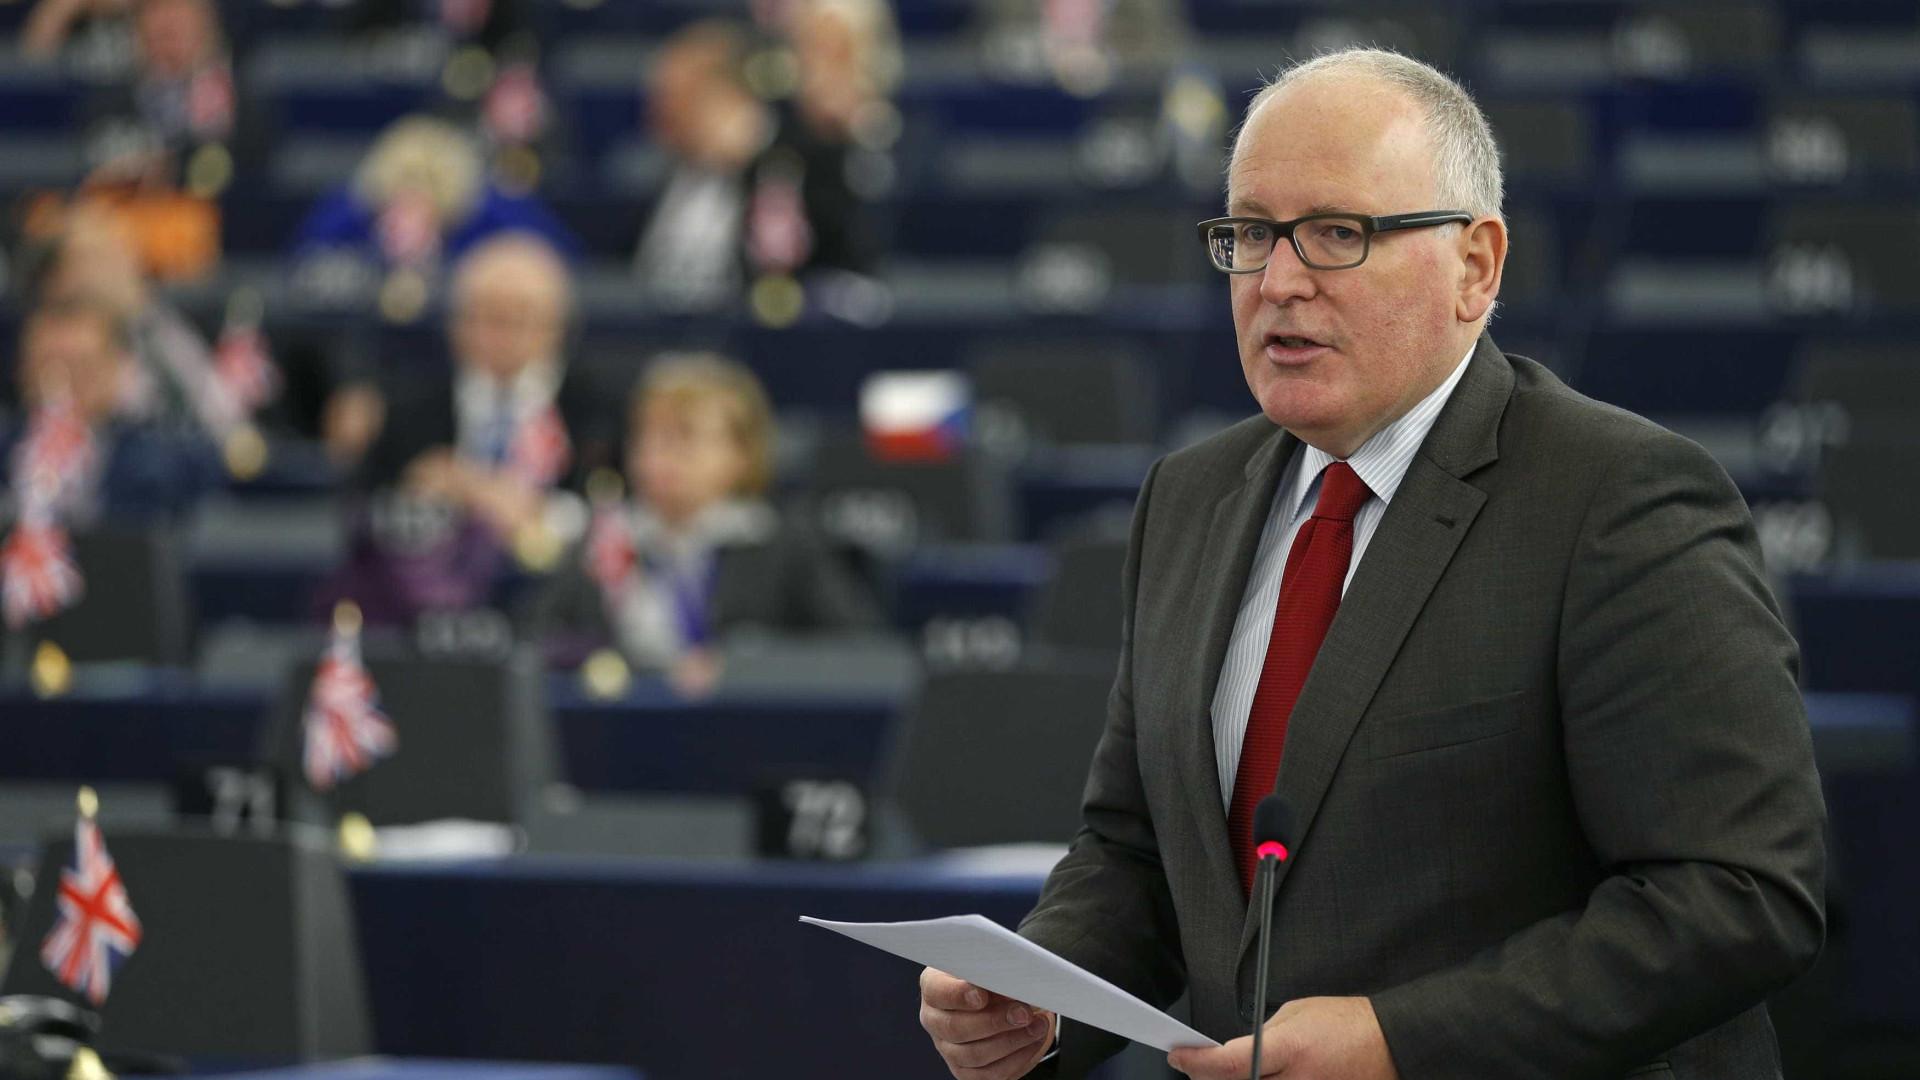 Socialista Frans Timmermans candidato à sucessão de Juncker em Bruxelas